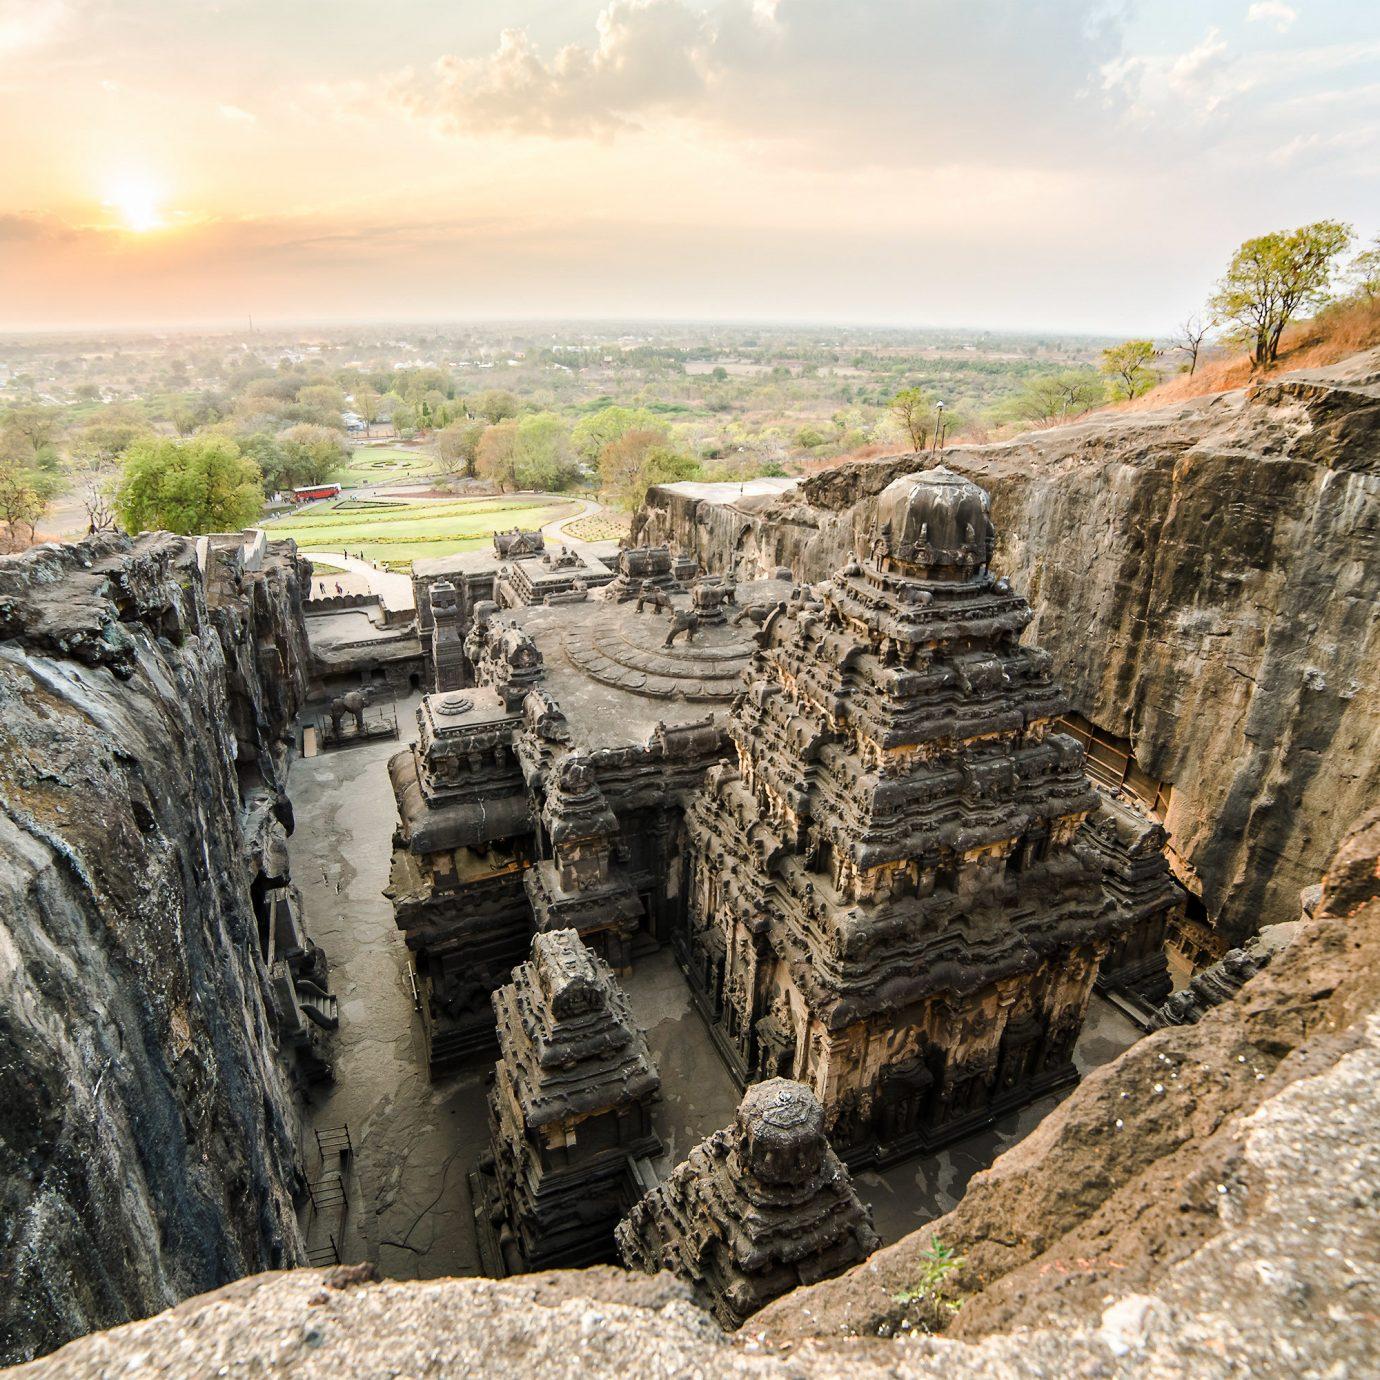 India rock archaeological site sky formation ancient history historic site escarpment badlands geology landscape Ruins tourism outcrop cliff